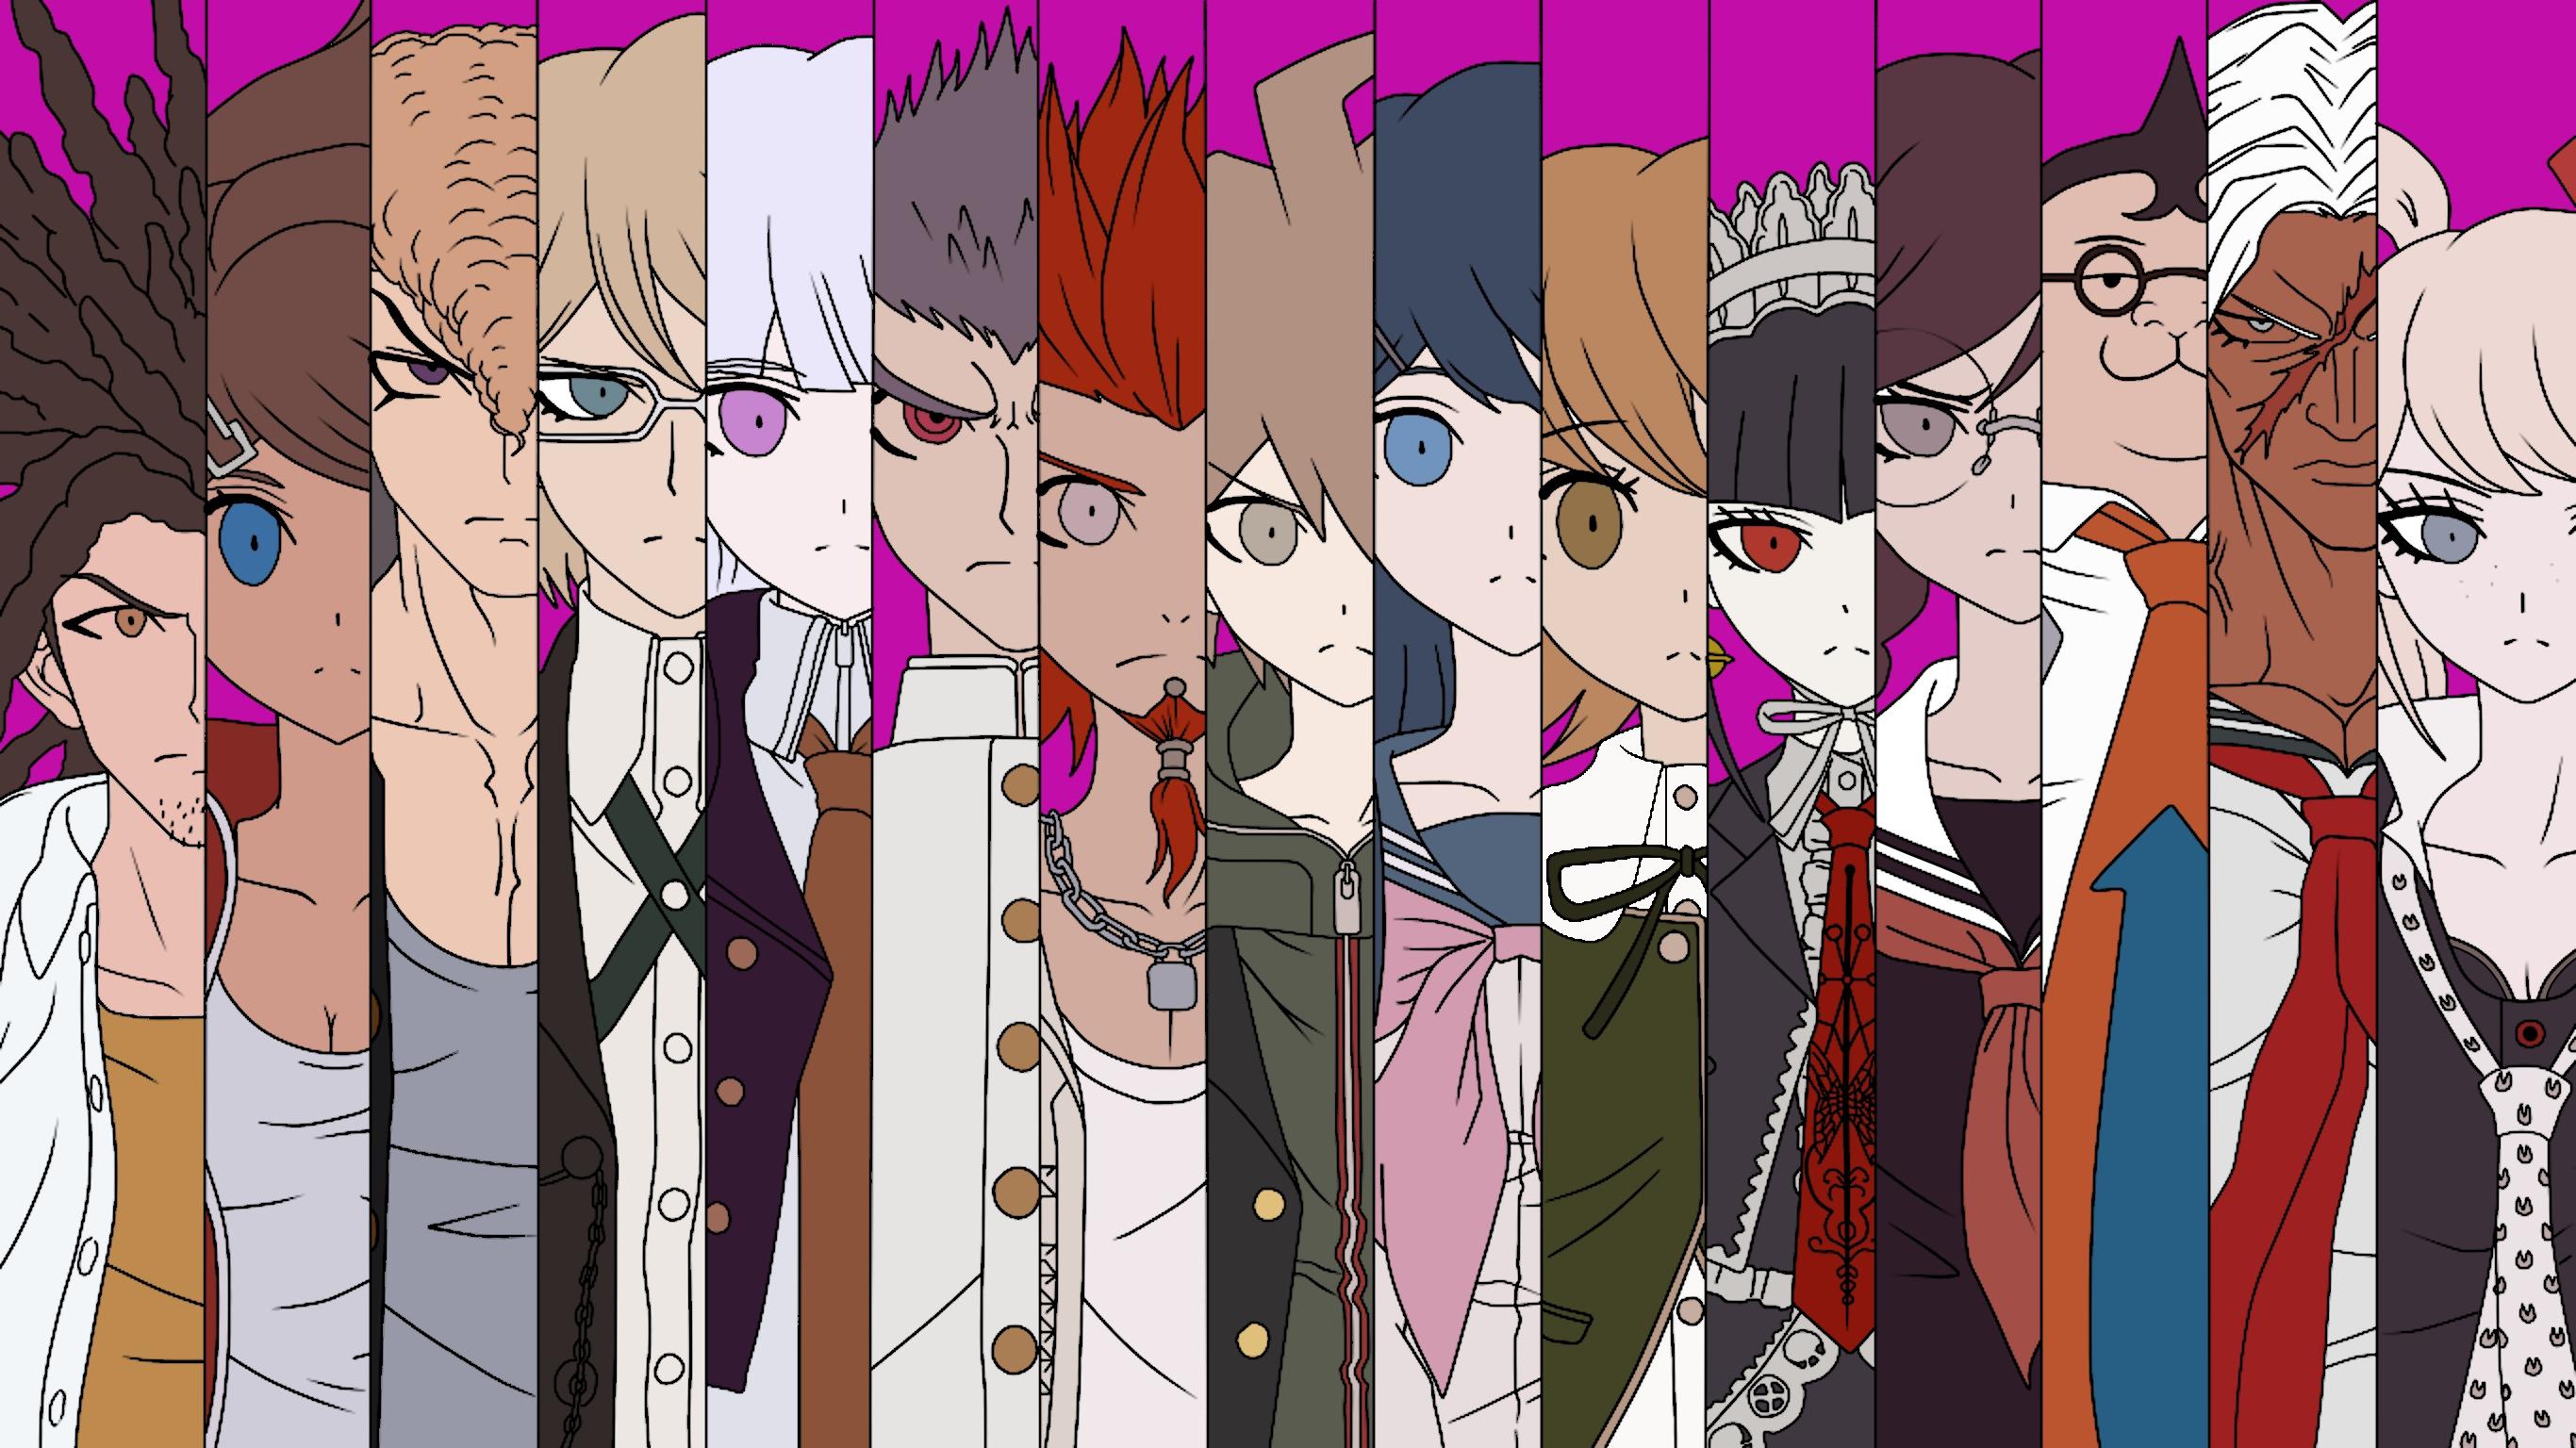 Danganronpa Anime Characters : Danganronpa characters hd by xero oc on deviantart